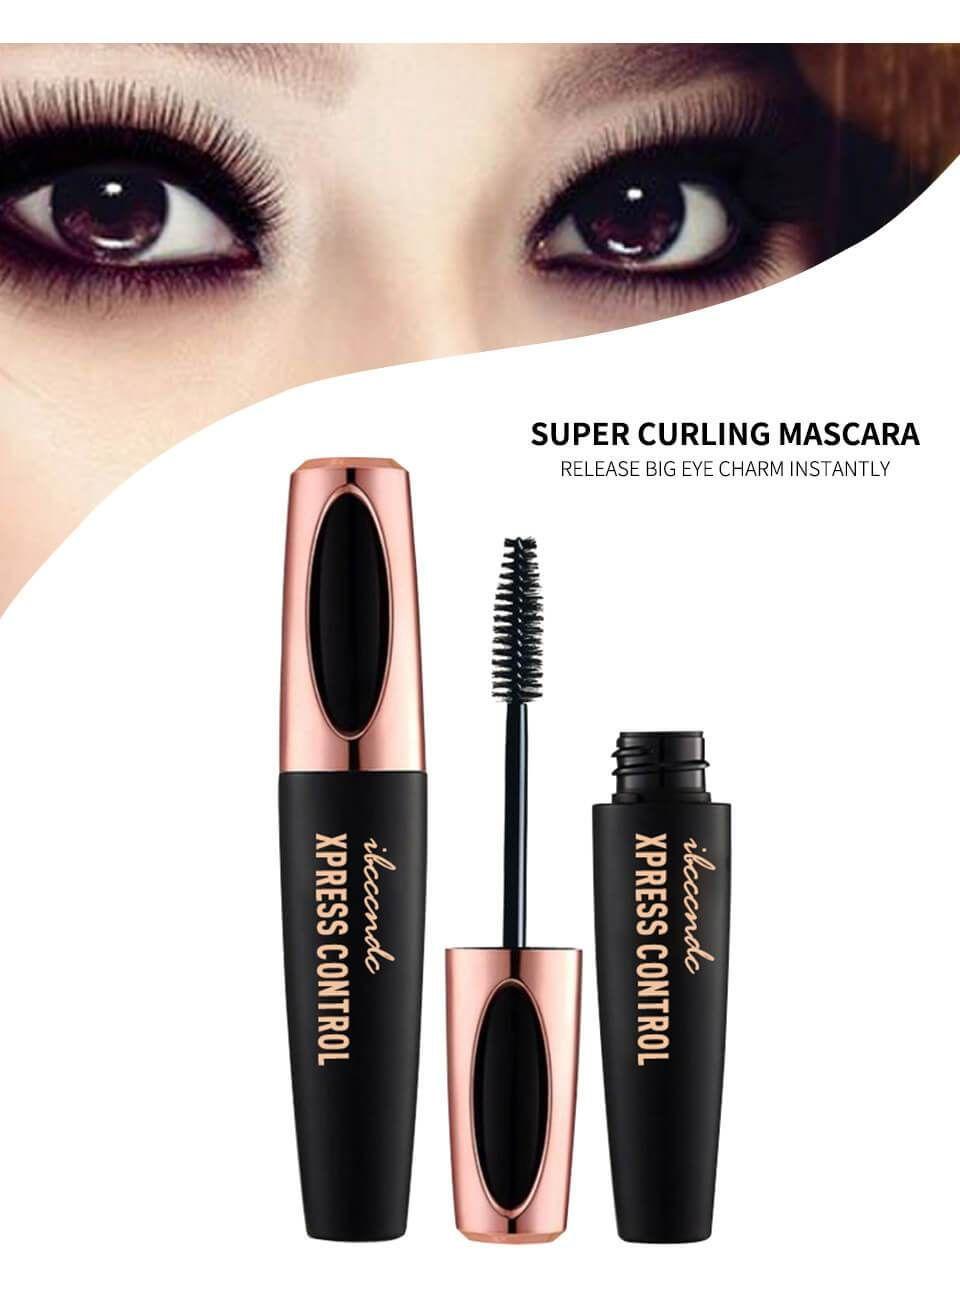 8b66b11f5a1 New 4D Silk Fiber Lash Mascara Waterproof Rimel 3d Mascara For Eyelash  Extension Black Thick Lengthening Eye Lashes Cosmetics